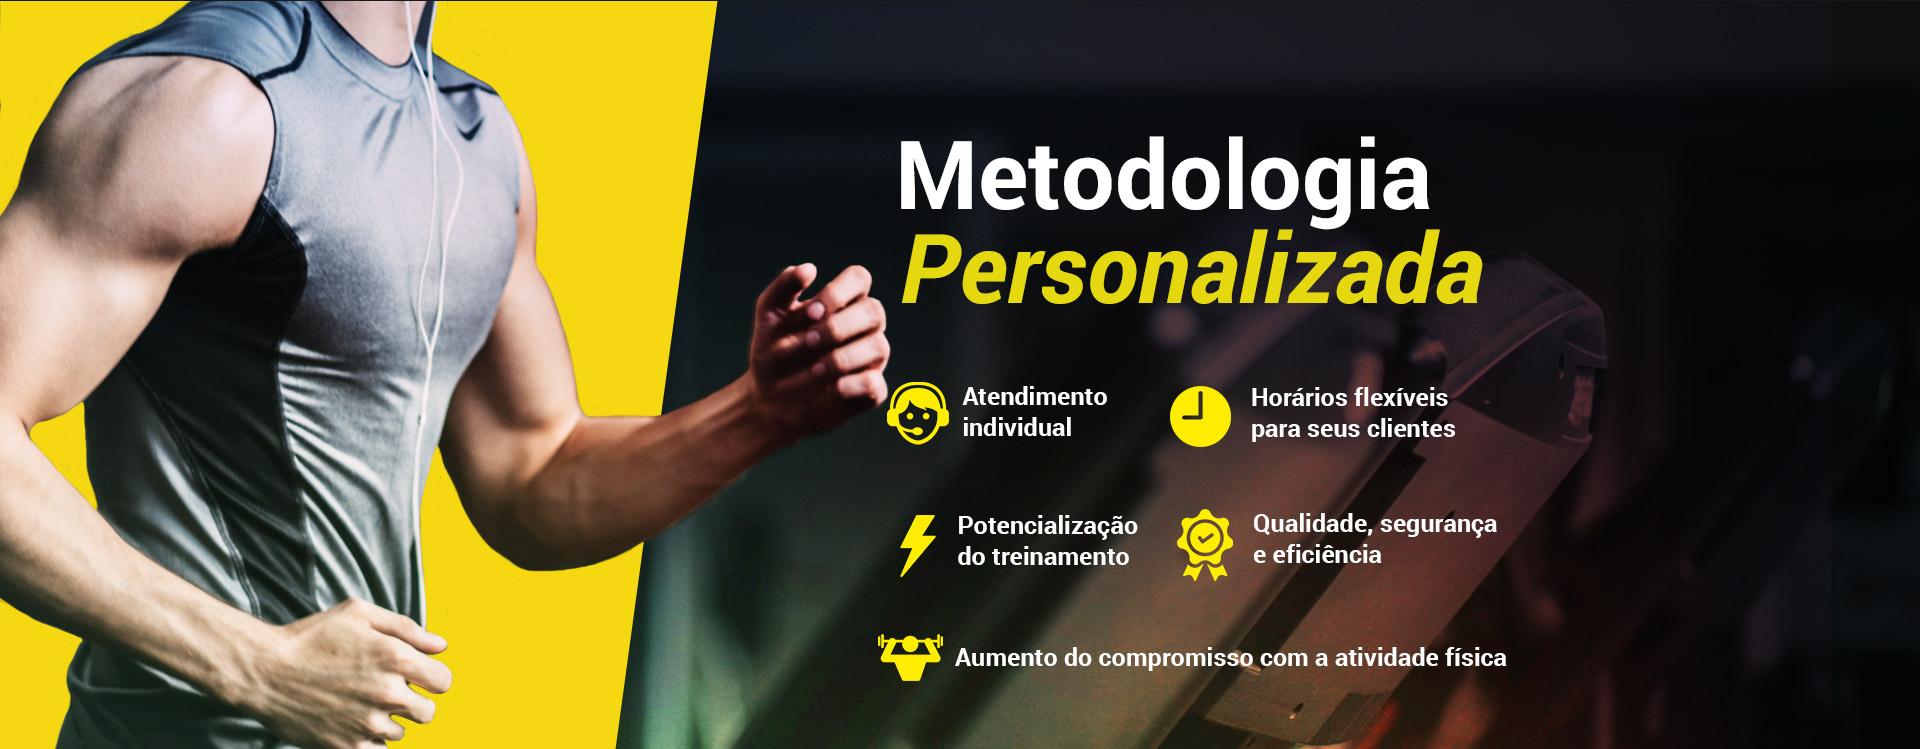 Banner 2 – Metodologia